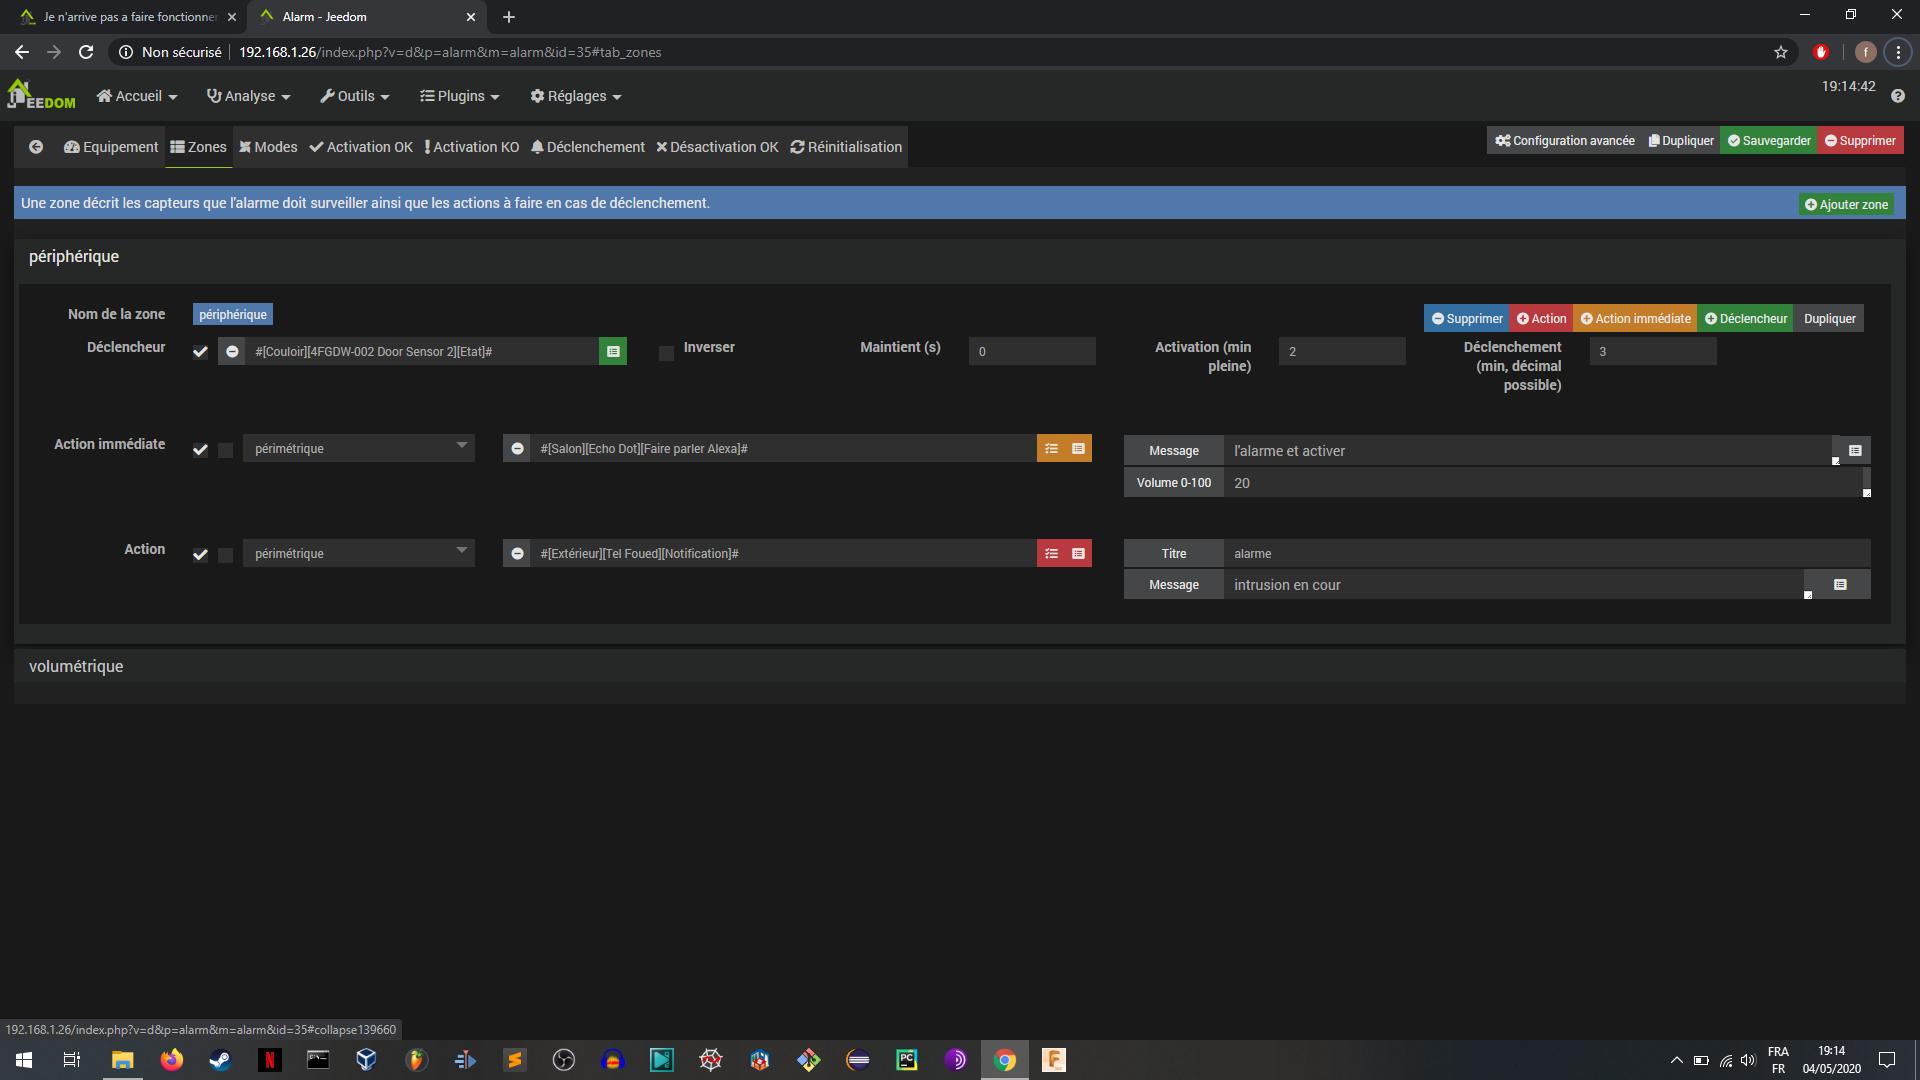 Desktop Screenshot 2020.05.04 - 19.14.42.49